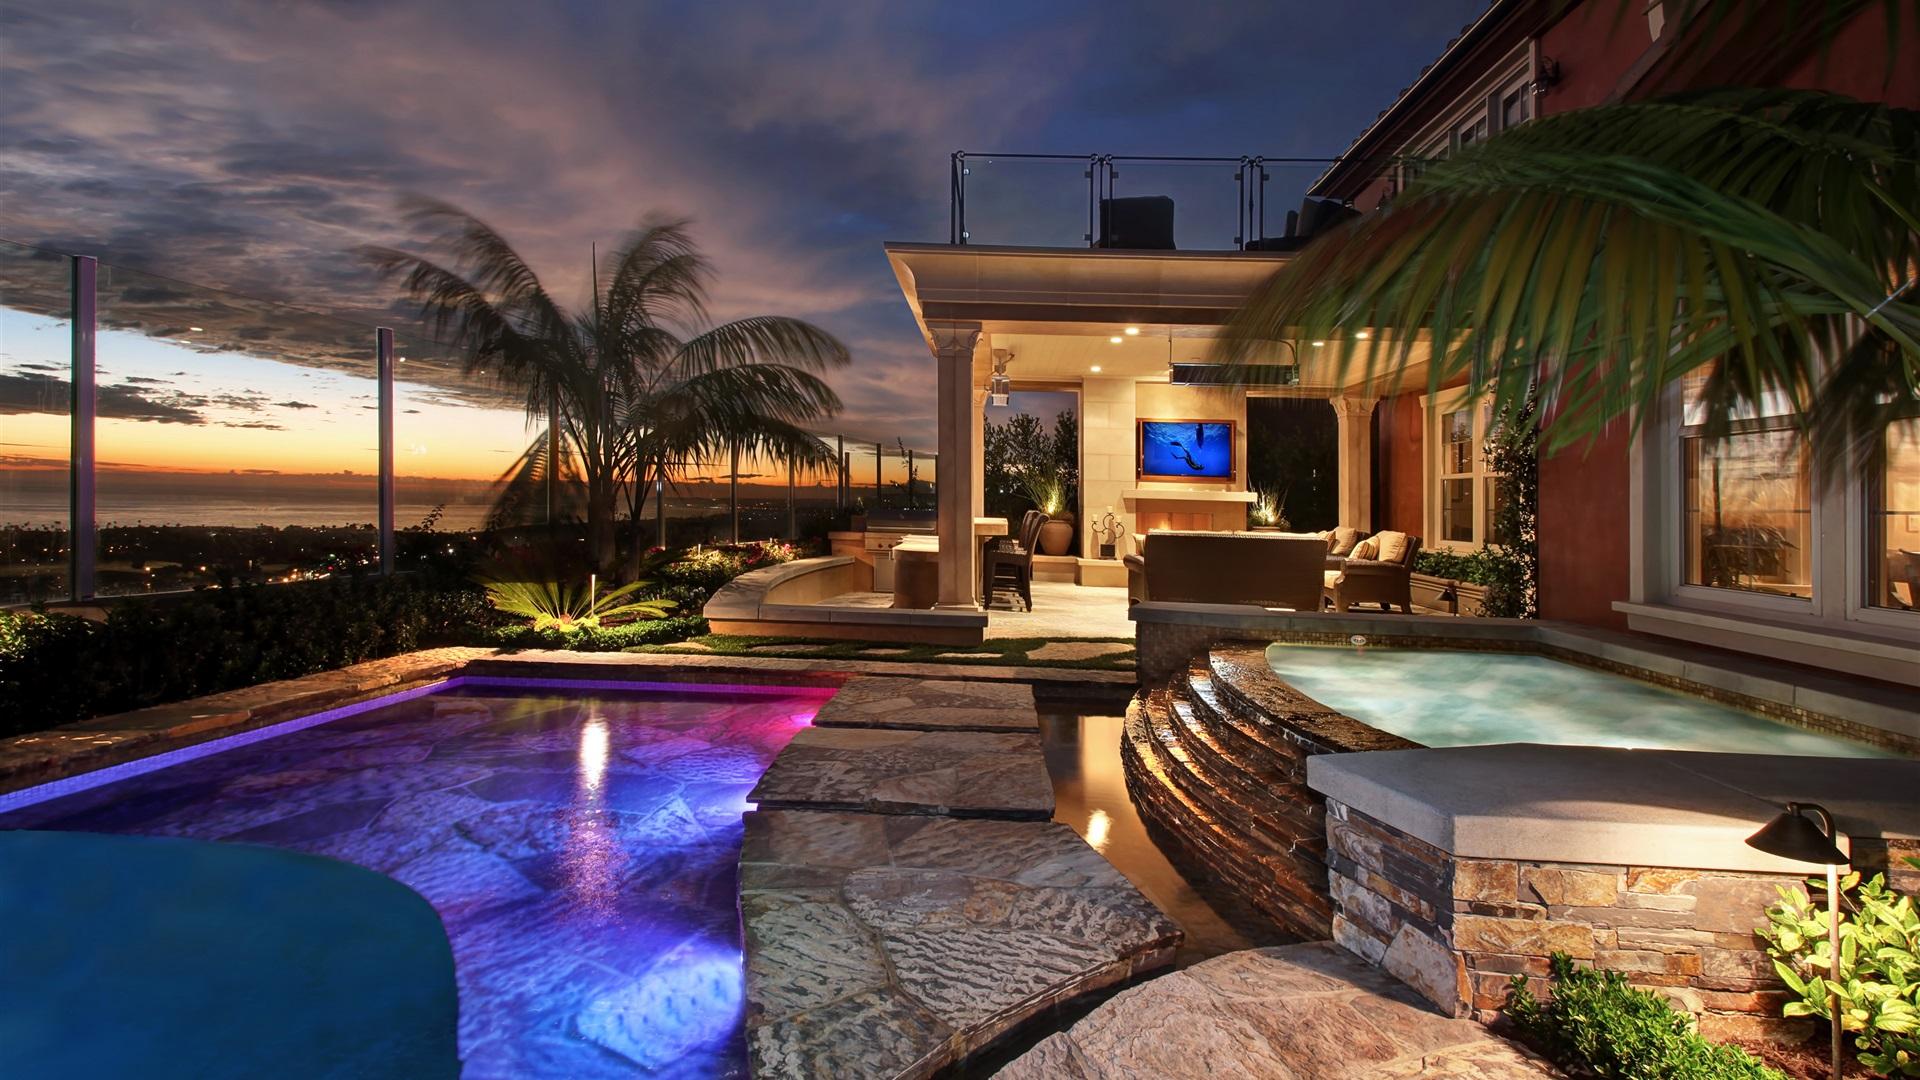 San-Clemente-resort-hotel-pool-lights-night-USA_1920x1080